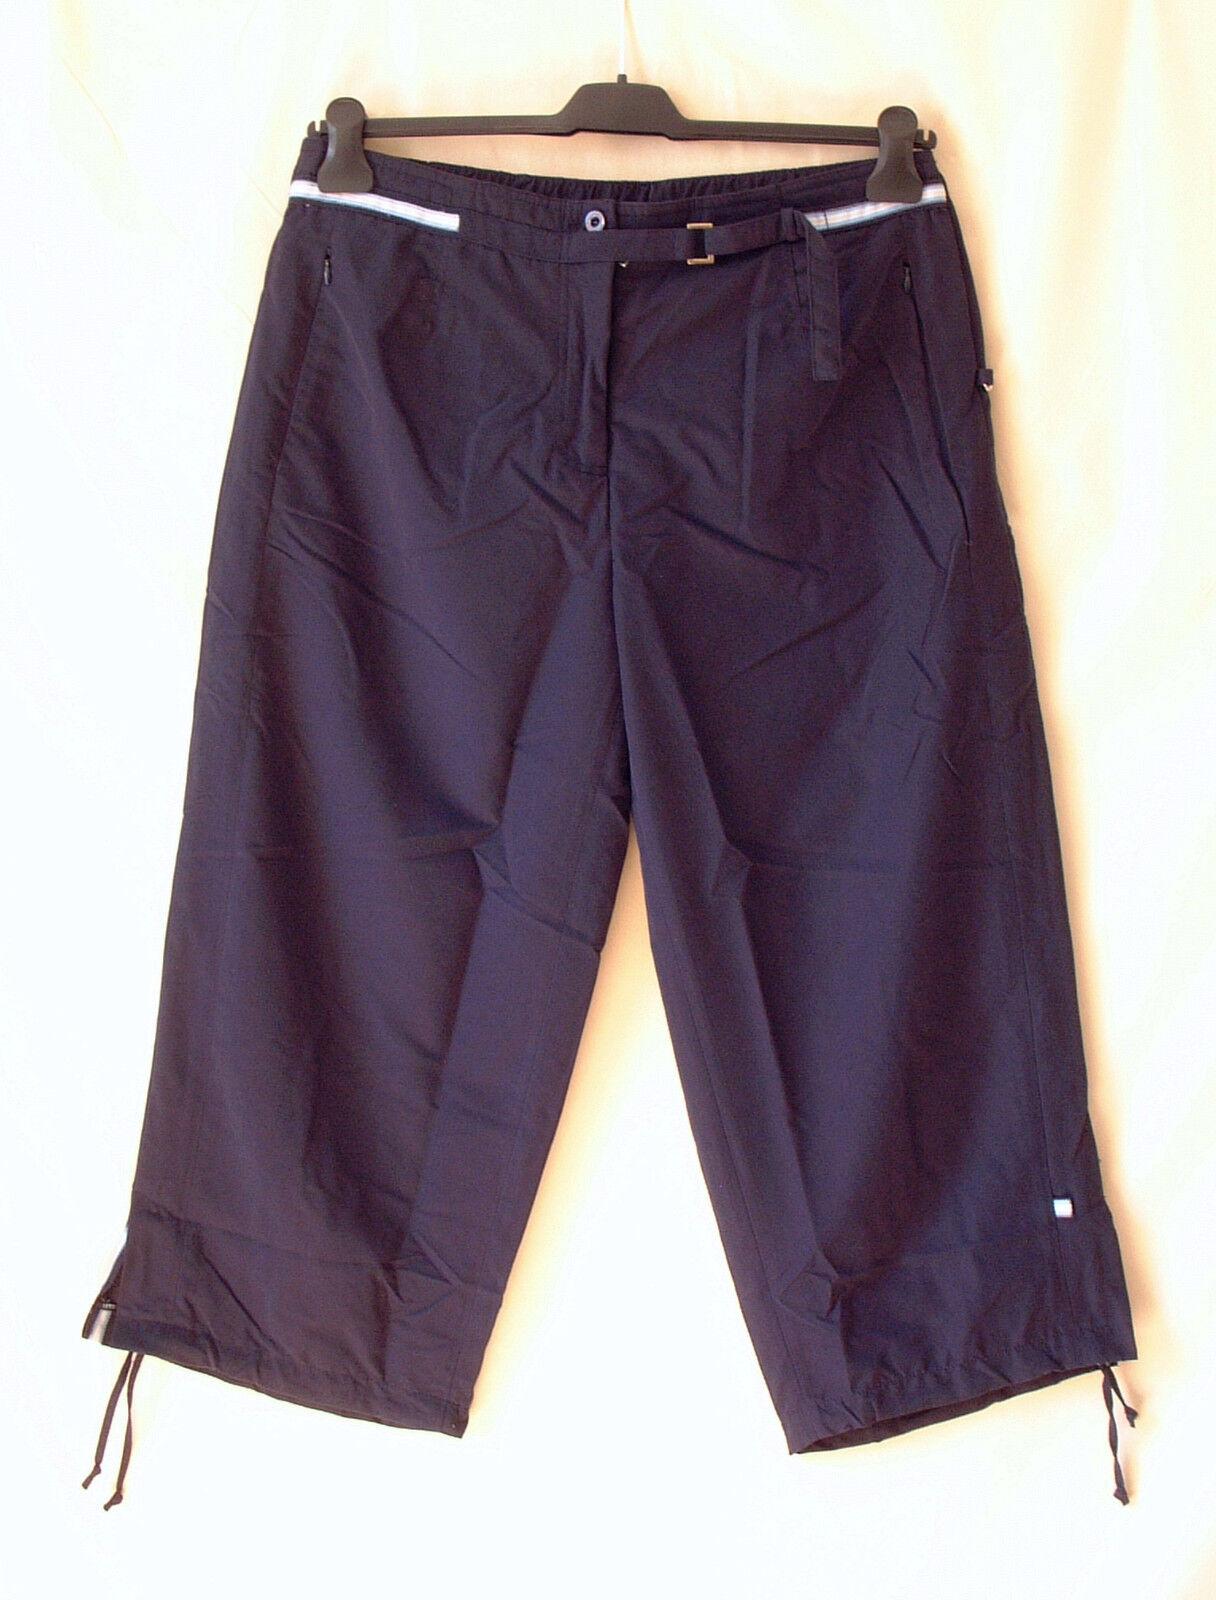 Hajo Trousers 3 4 Length Dark Blau Cuffed in the Back Stretchy New daMänner Größe